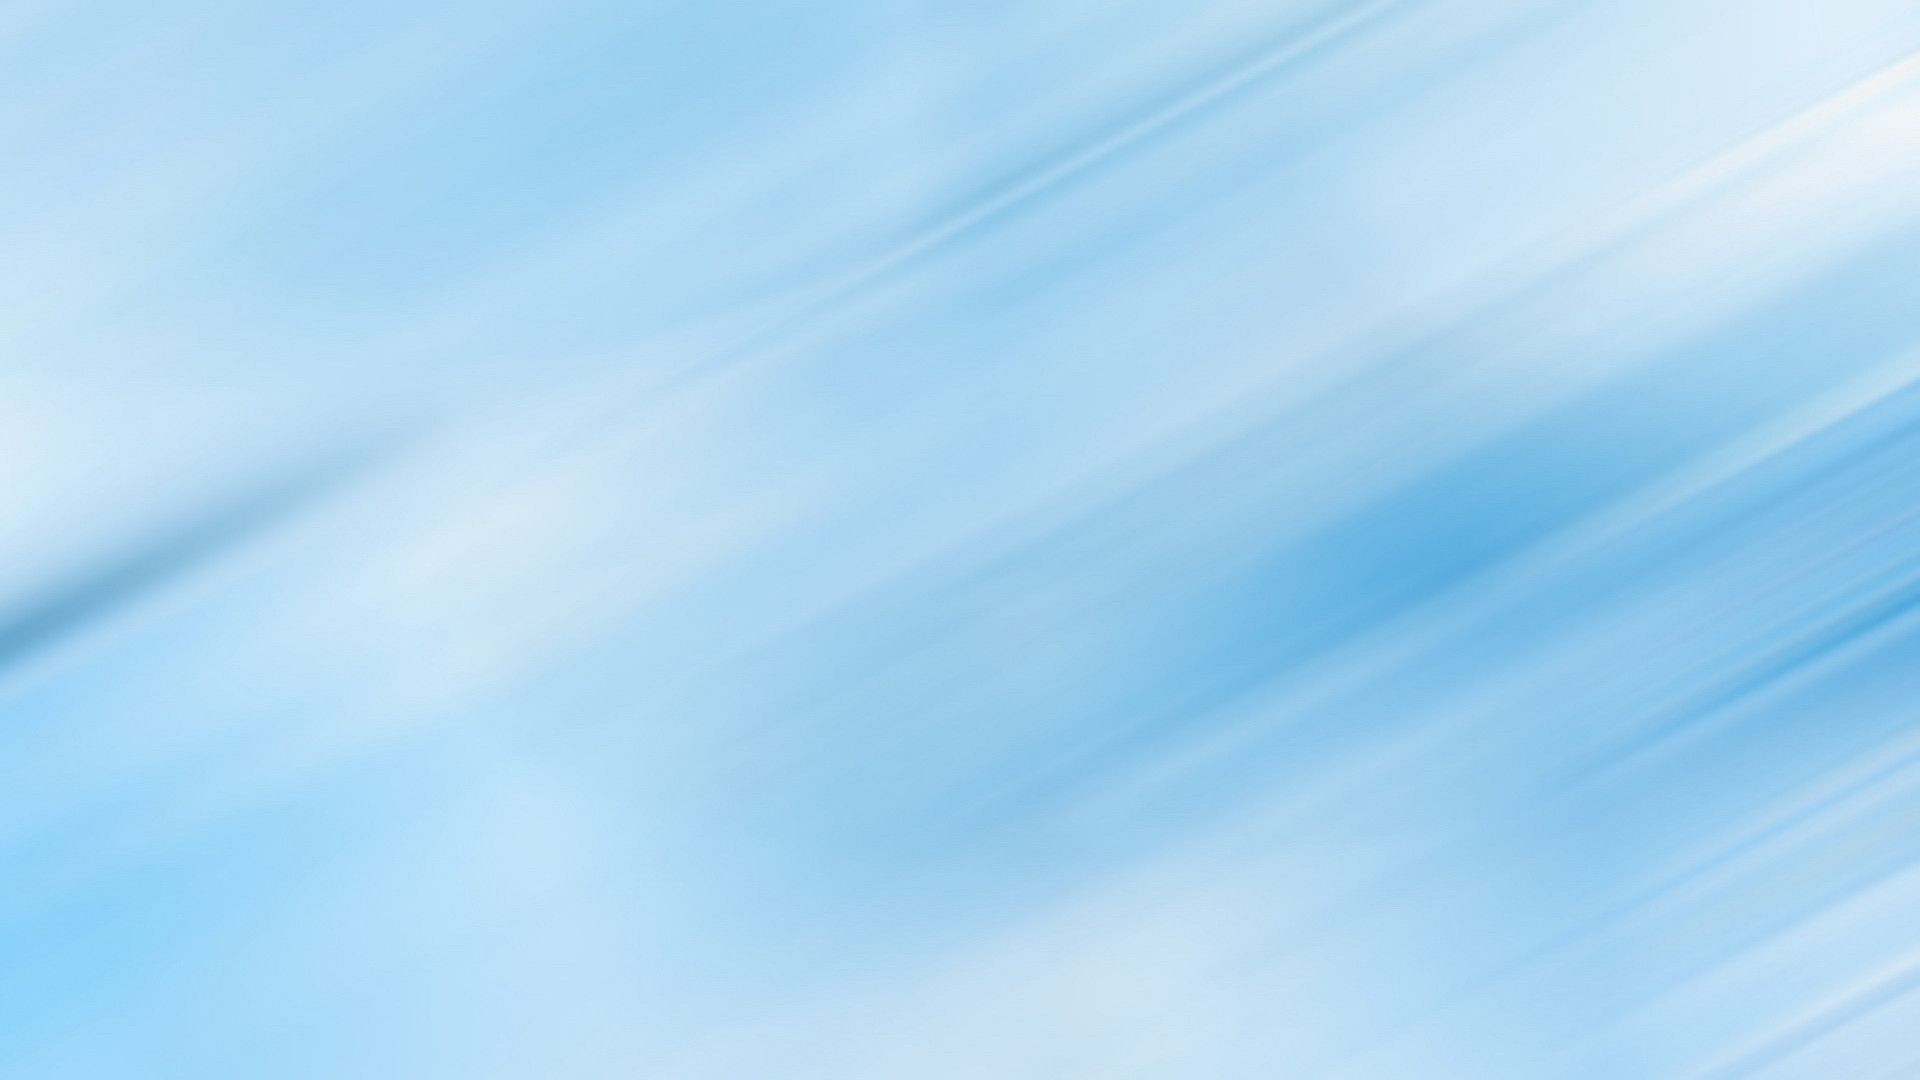 background blue download free amazing hd backgrounds for desktop